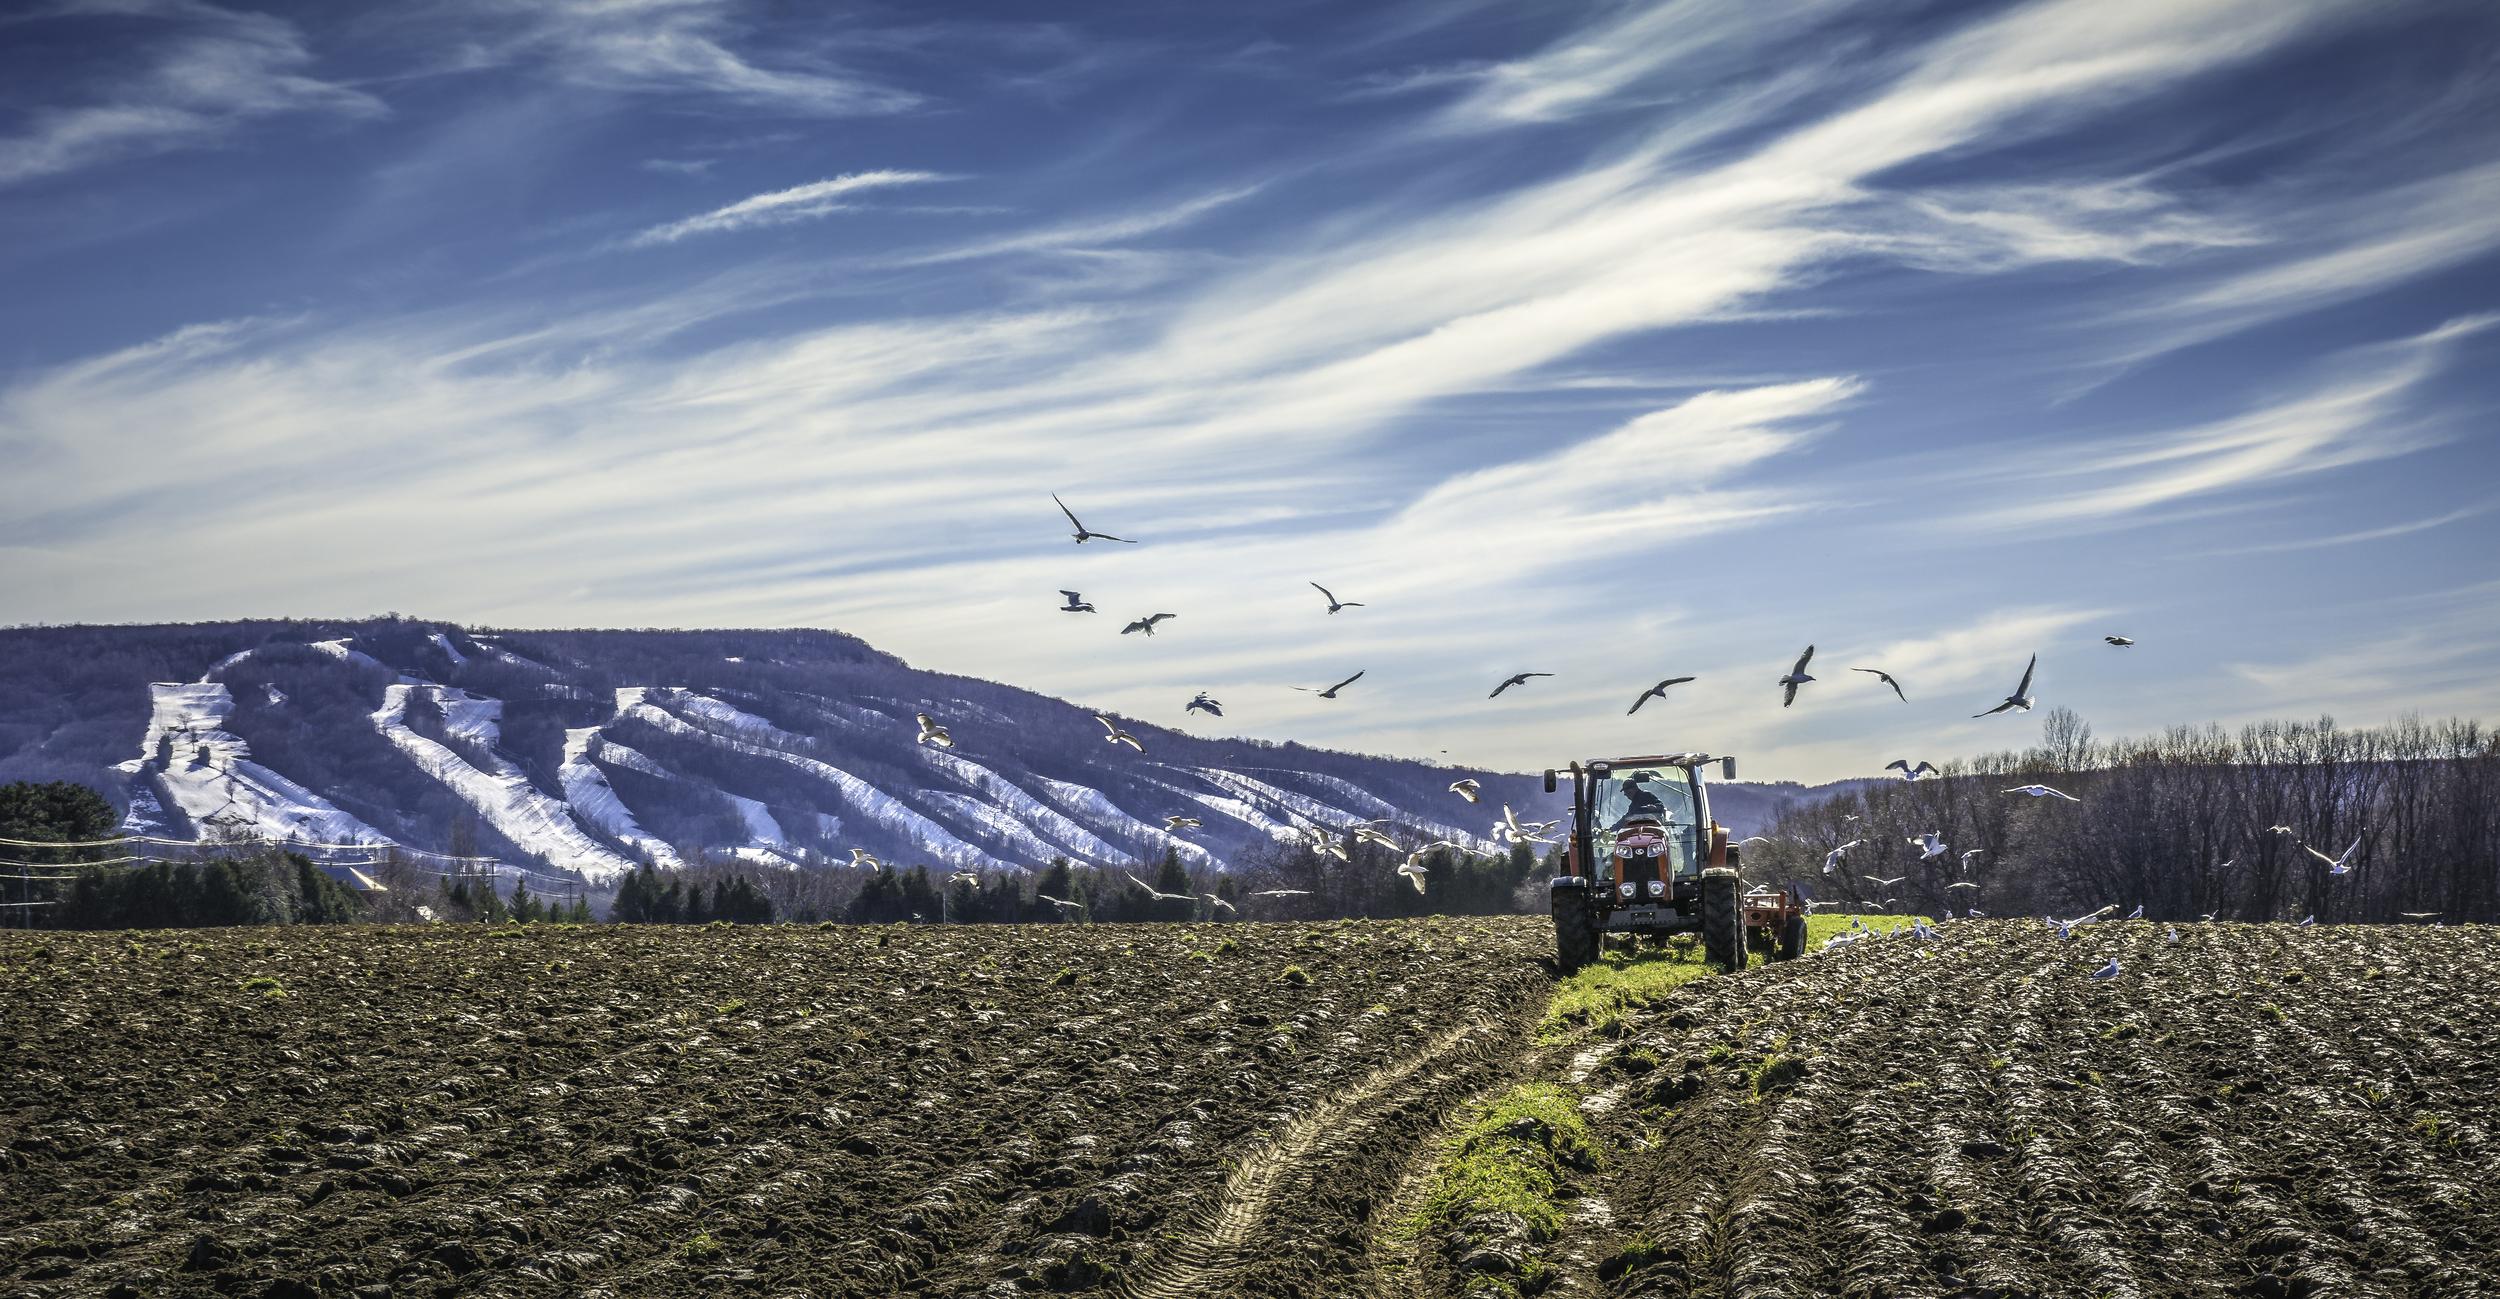 RGP-240 FARMER & SEAGULLS 15.14.04-1.jpg